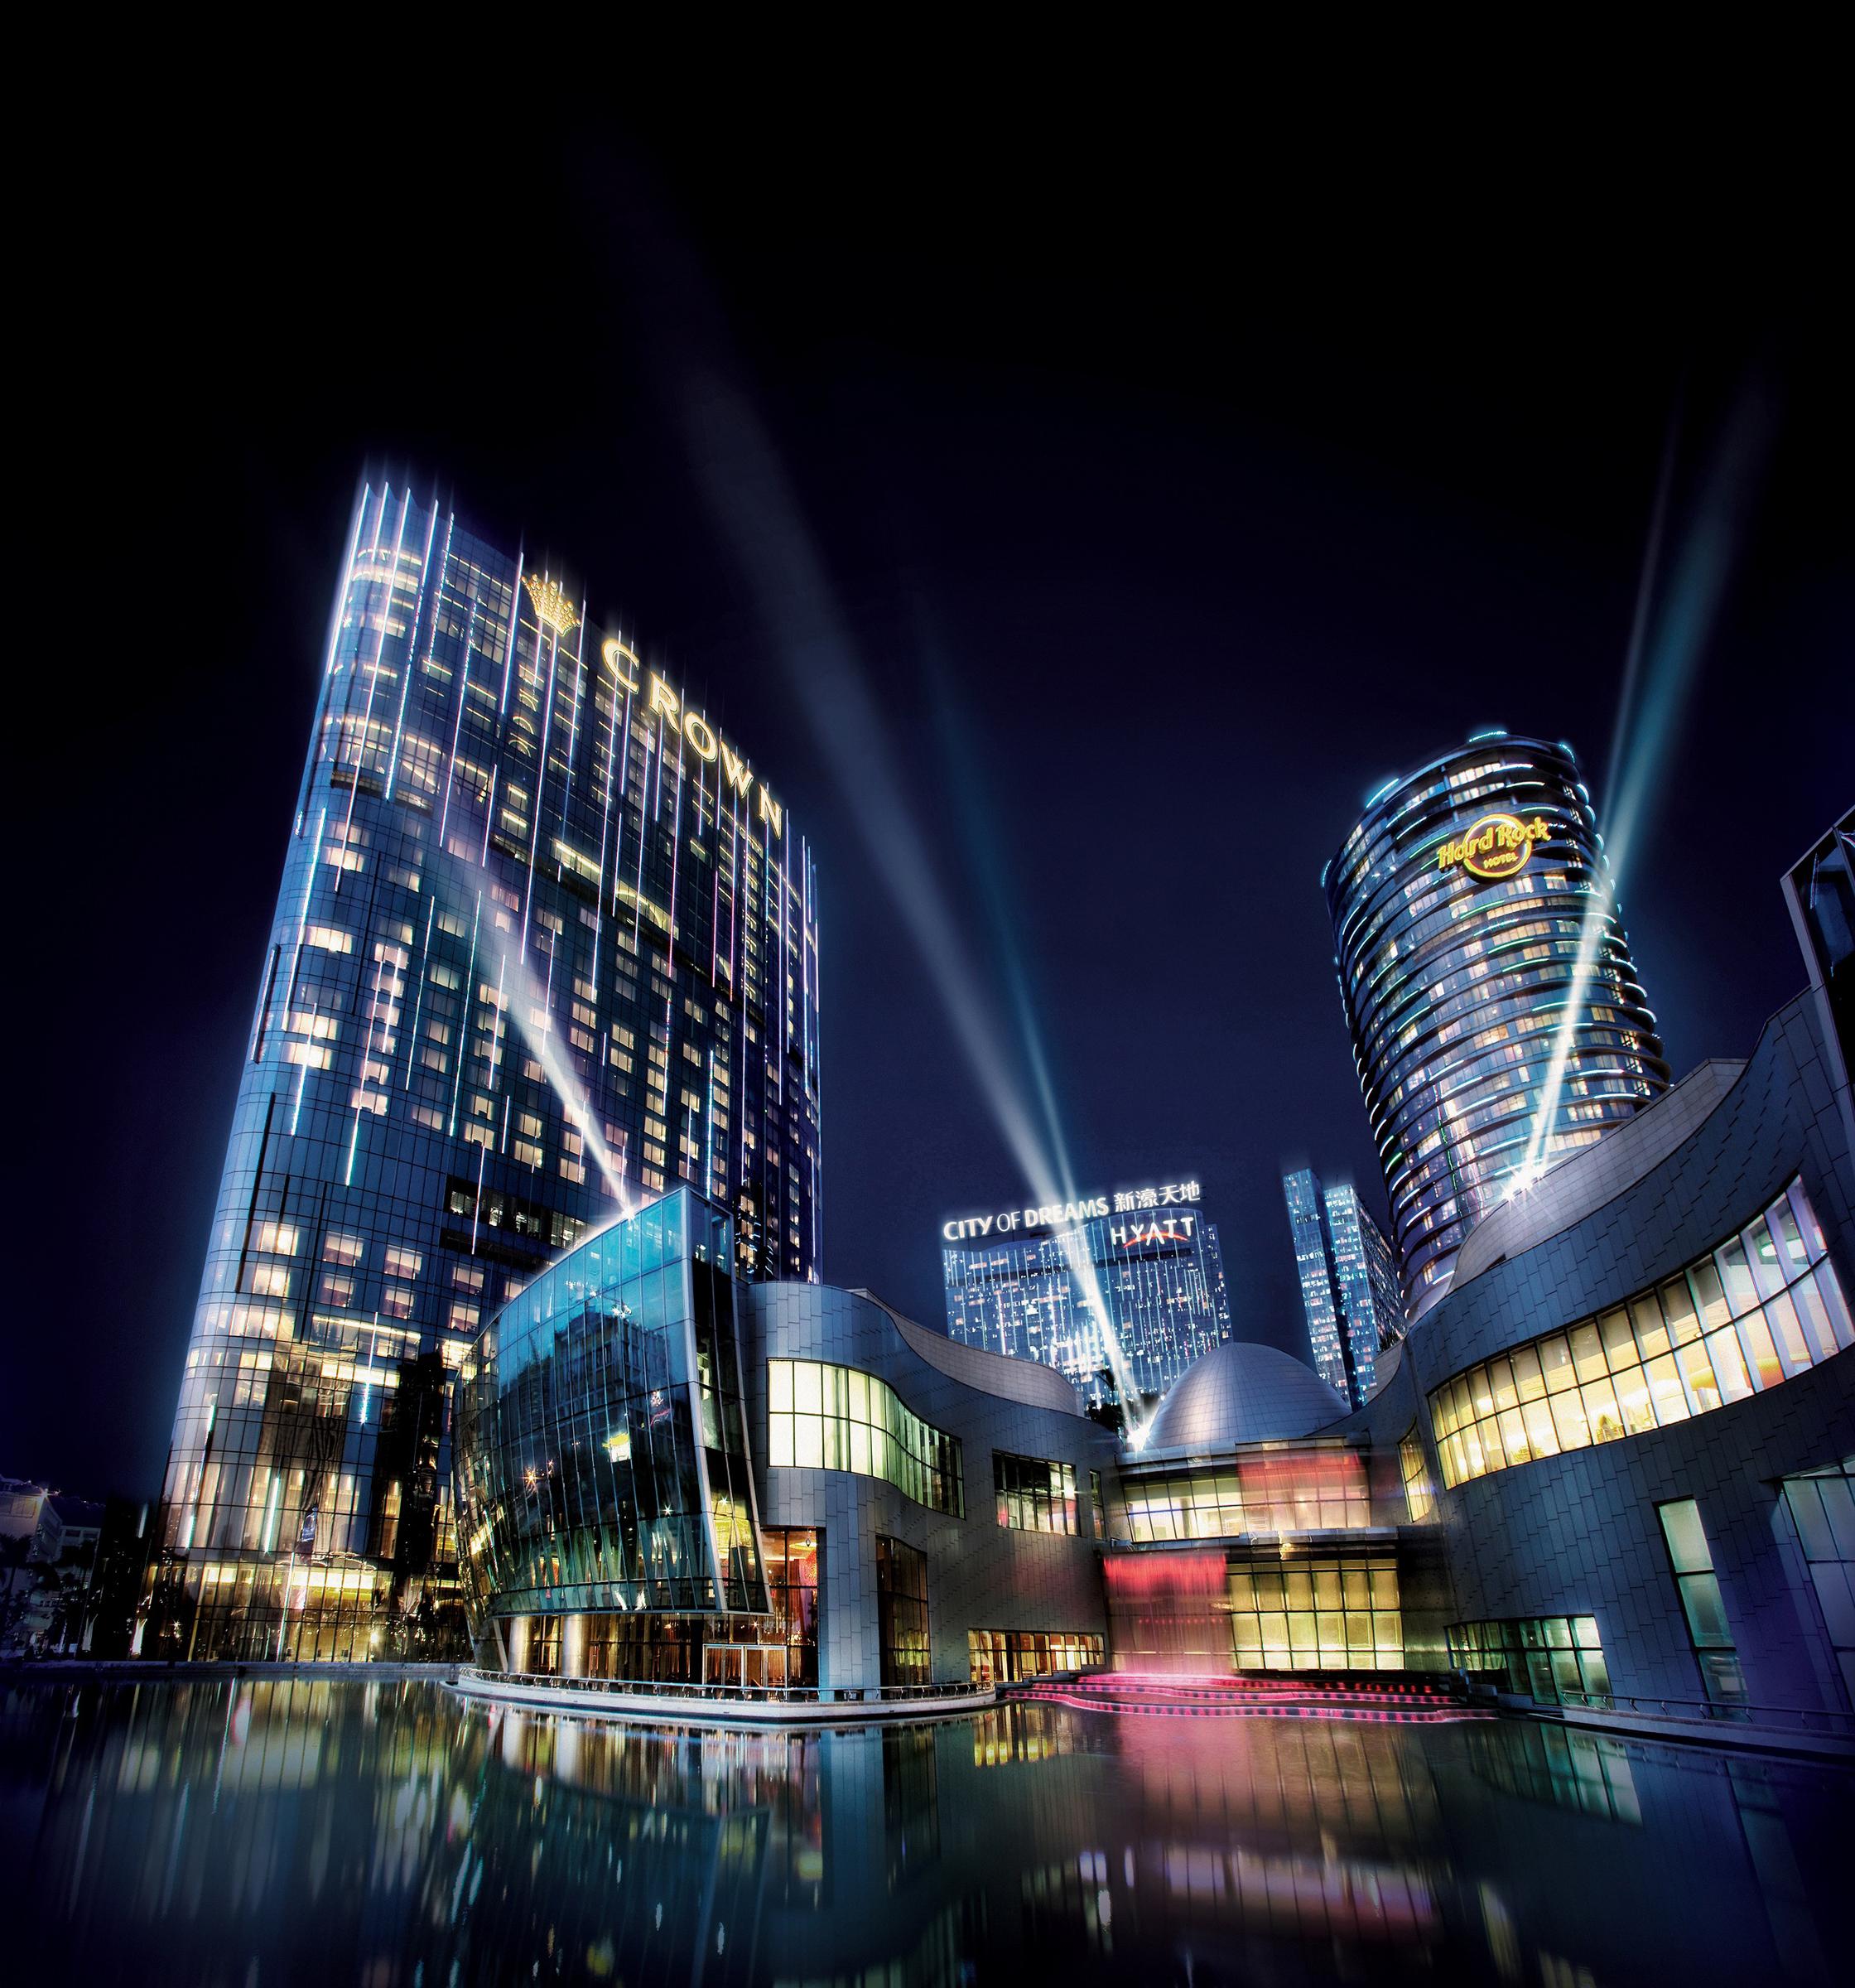 city of dreams casino hiring 2019